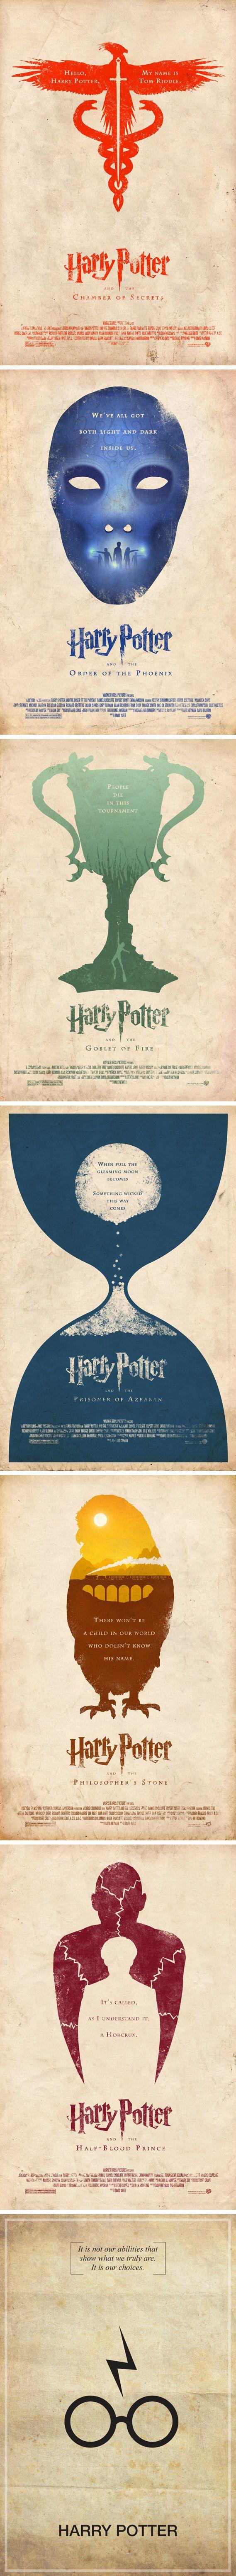 Alternate Harry Potter movie posters. I love the Prisoner one!